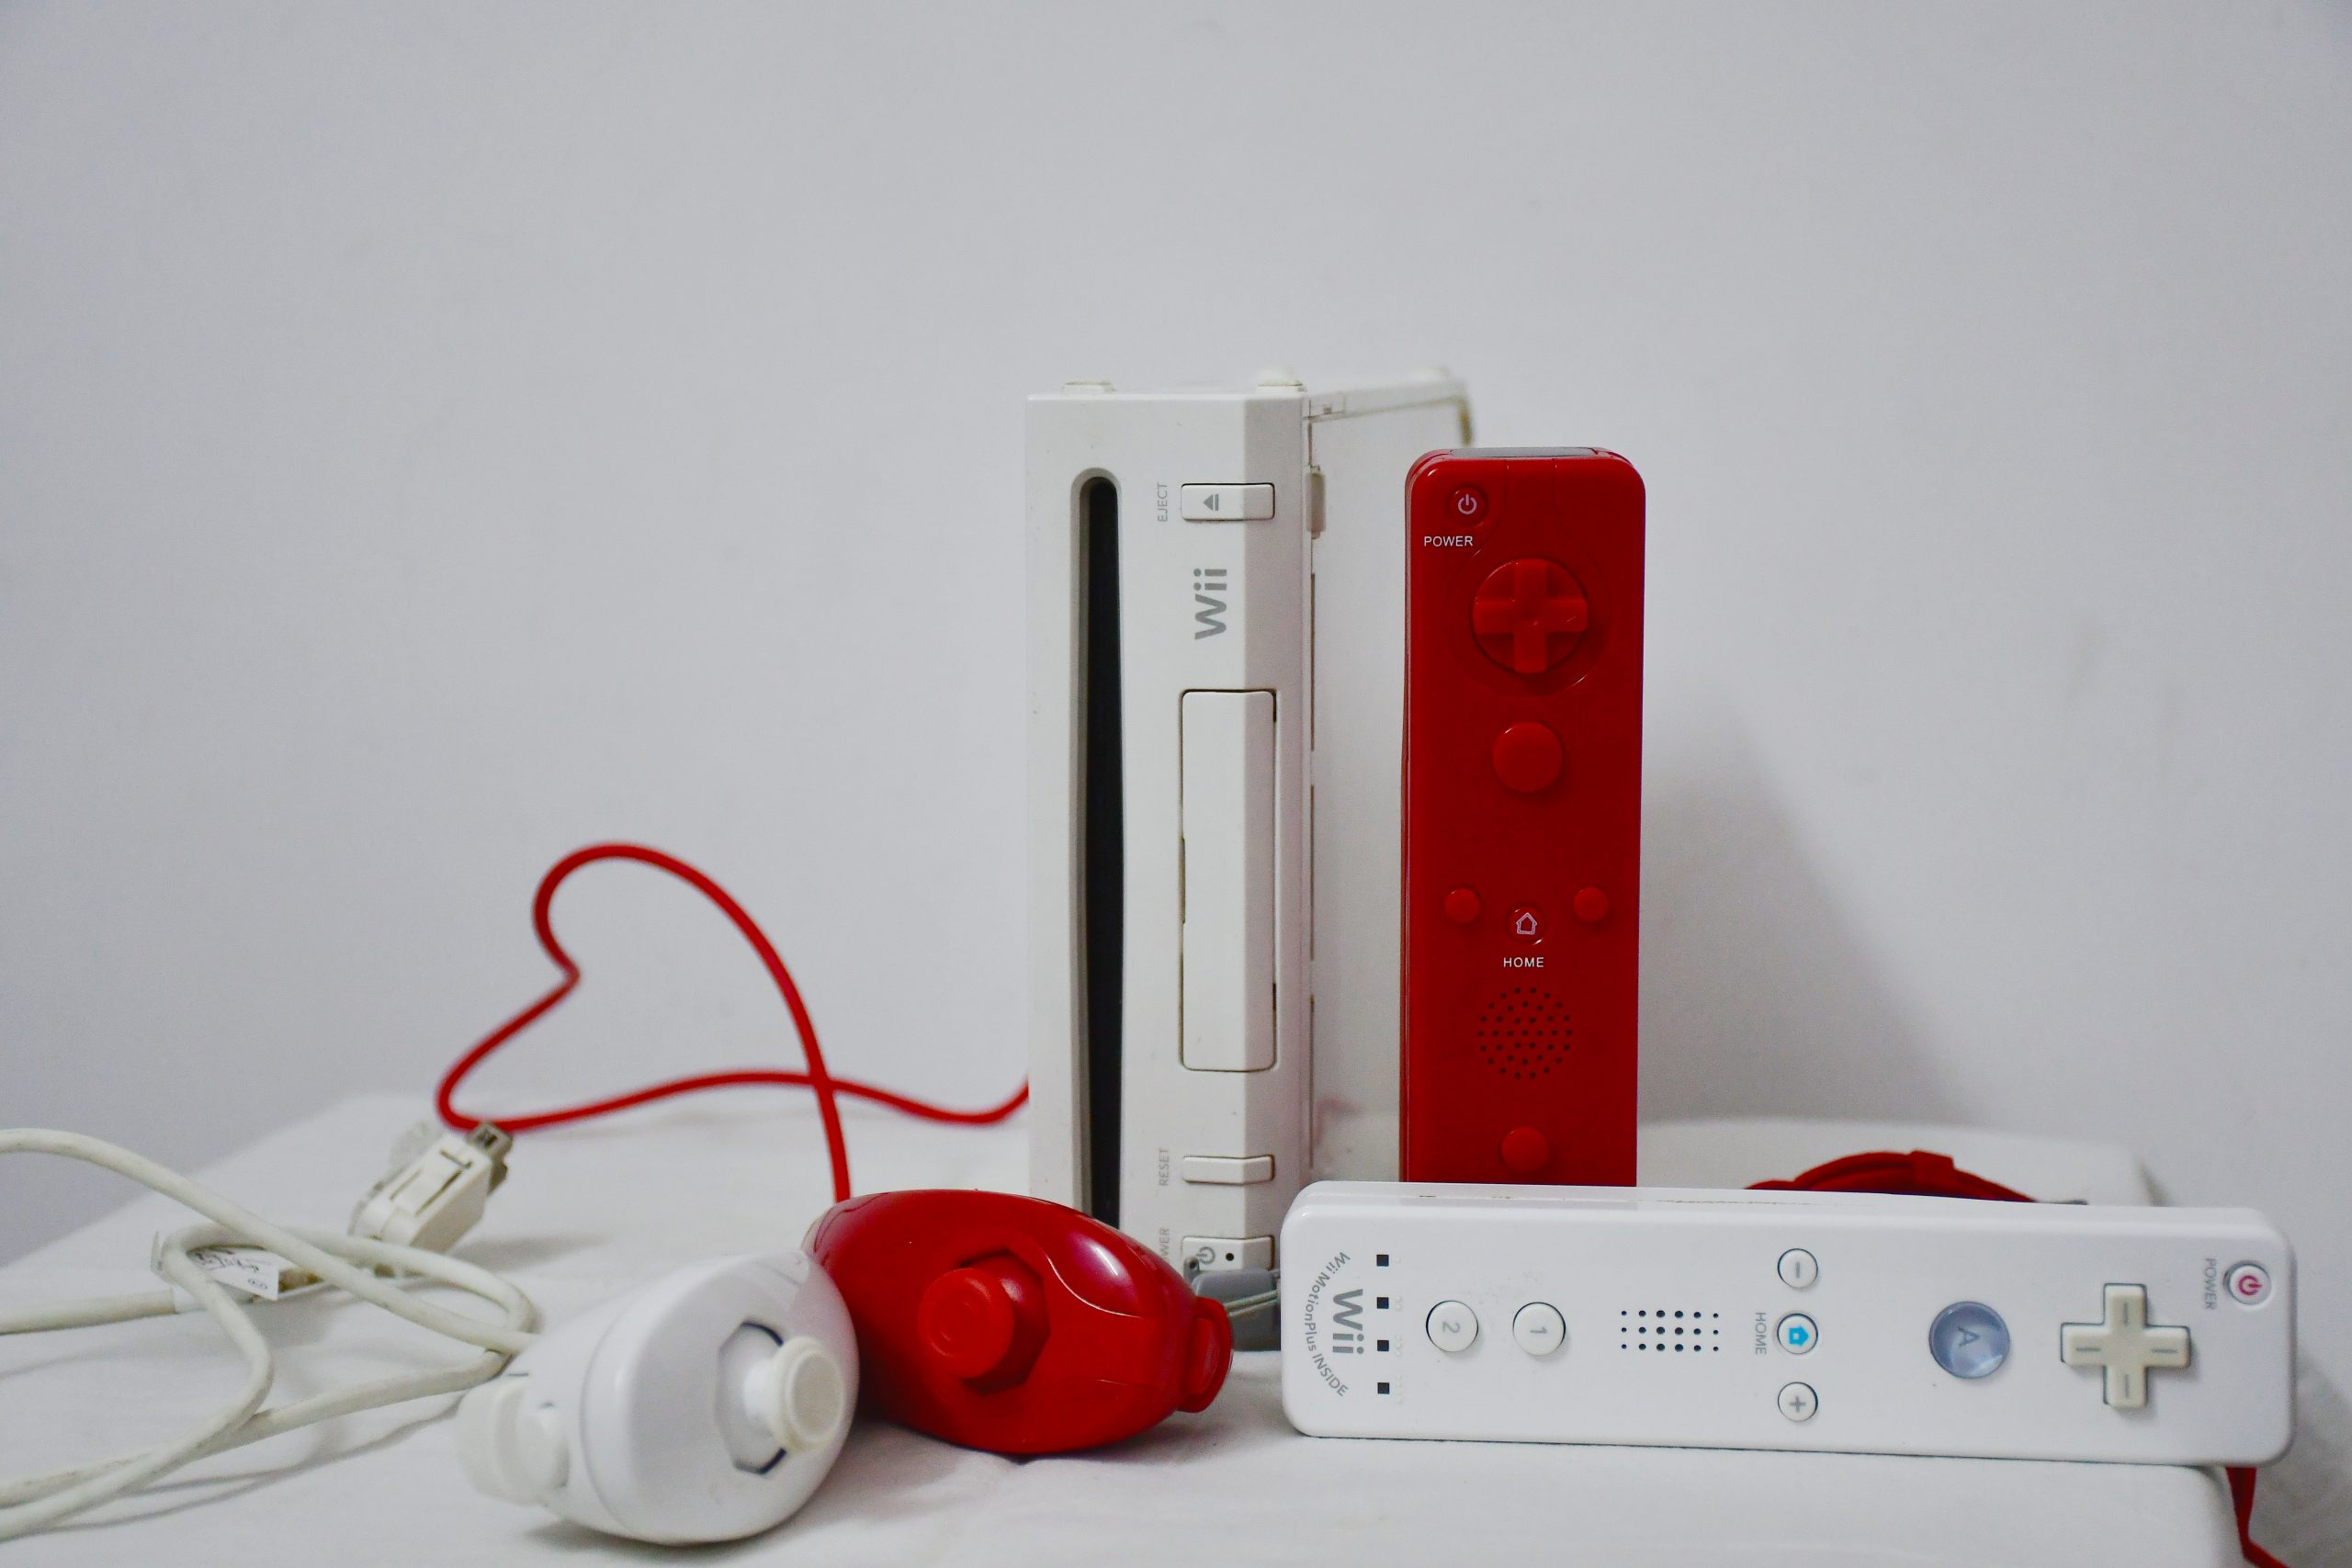 Nintendo switch system